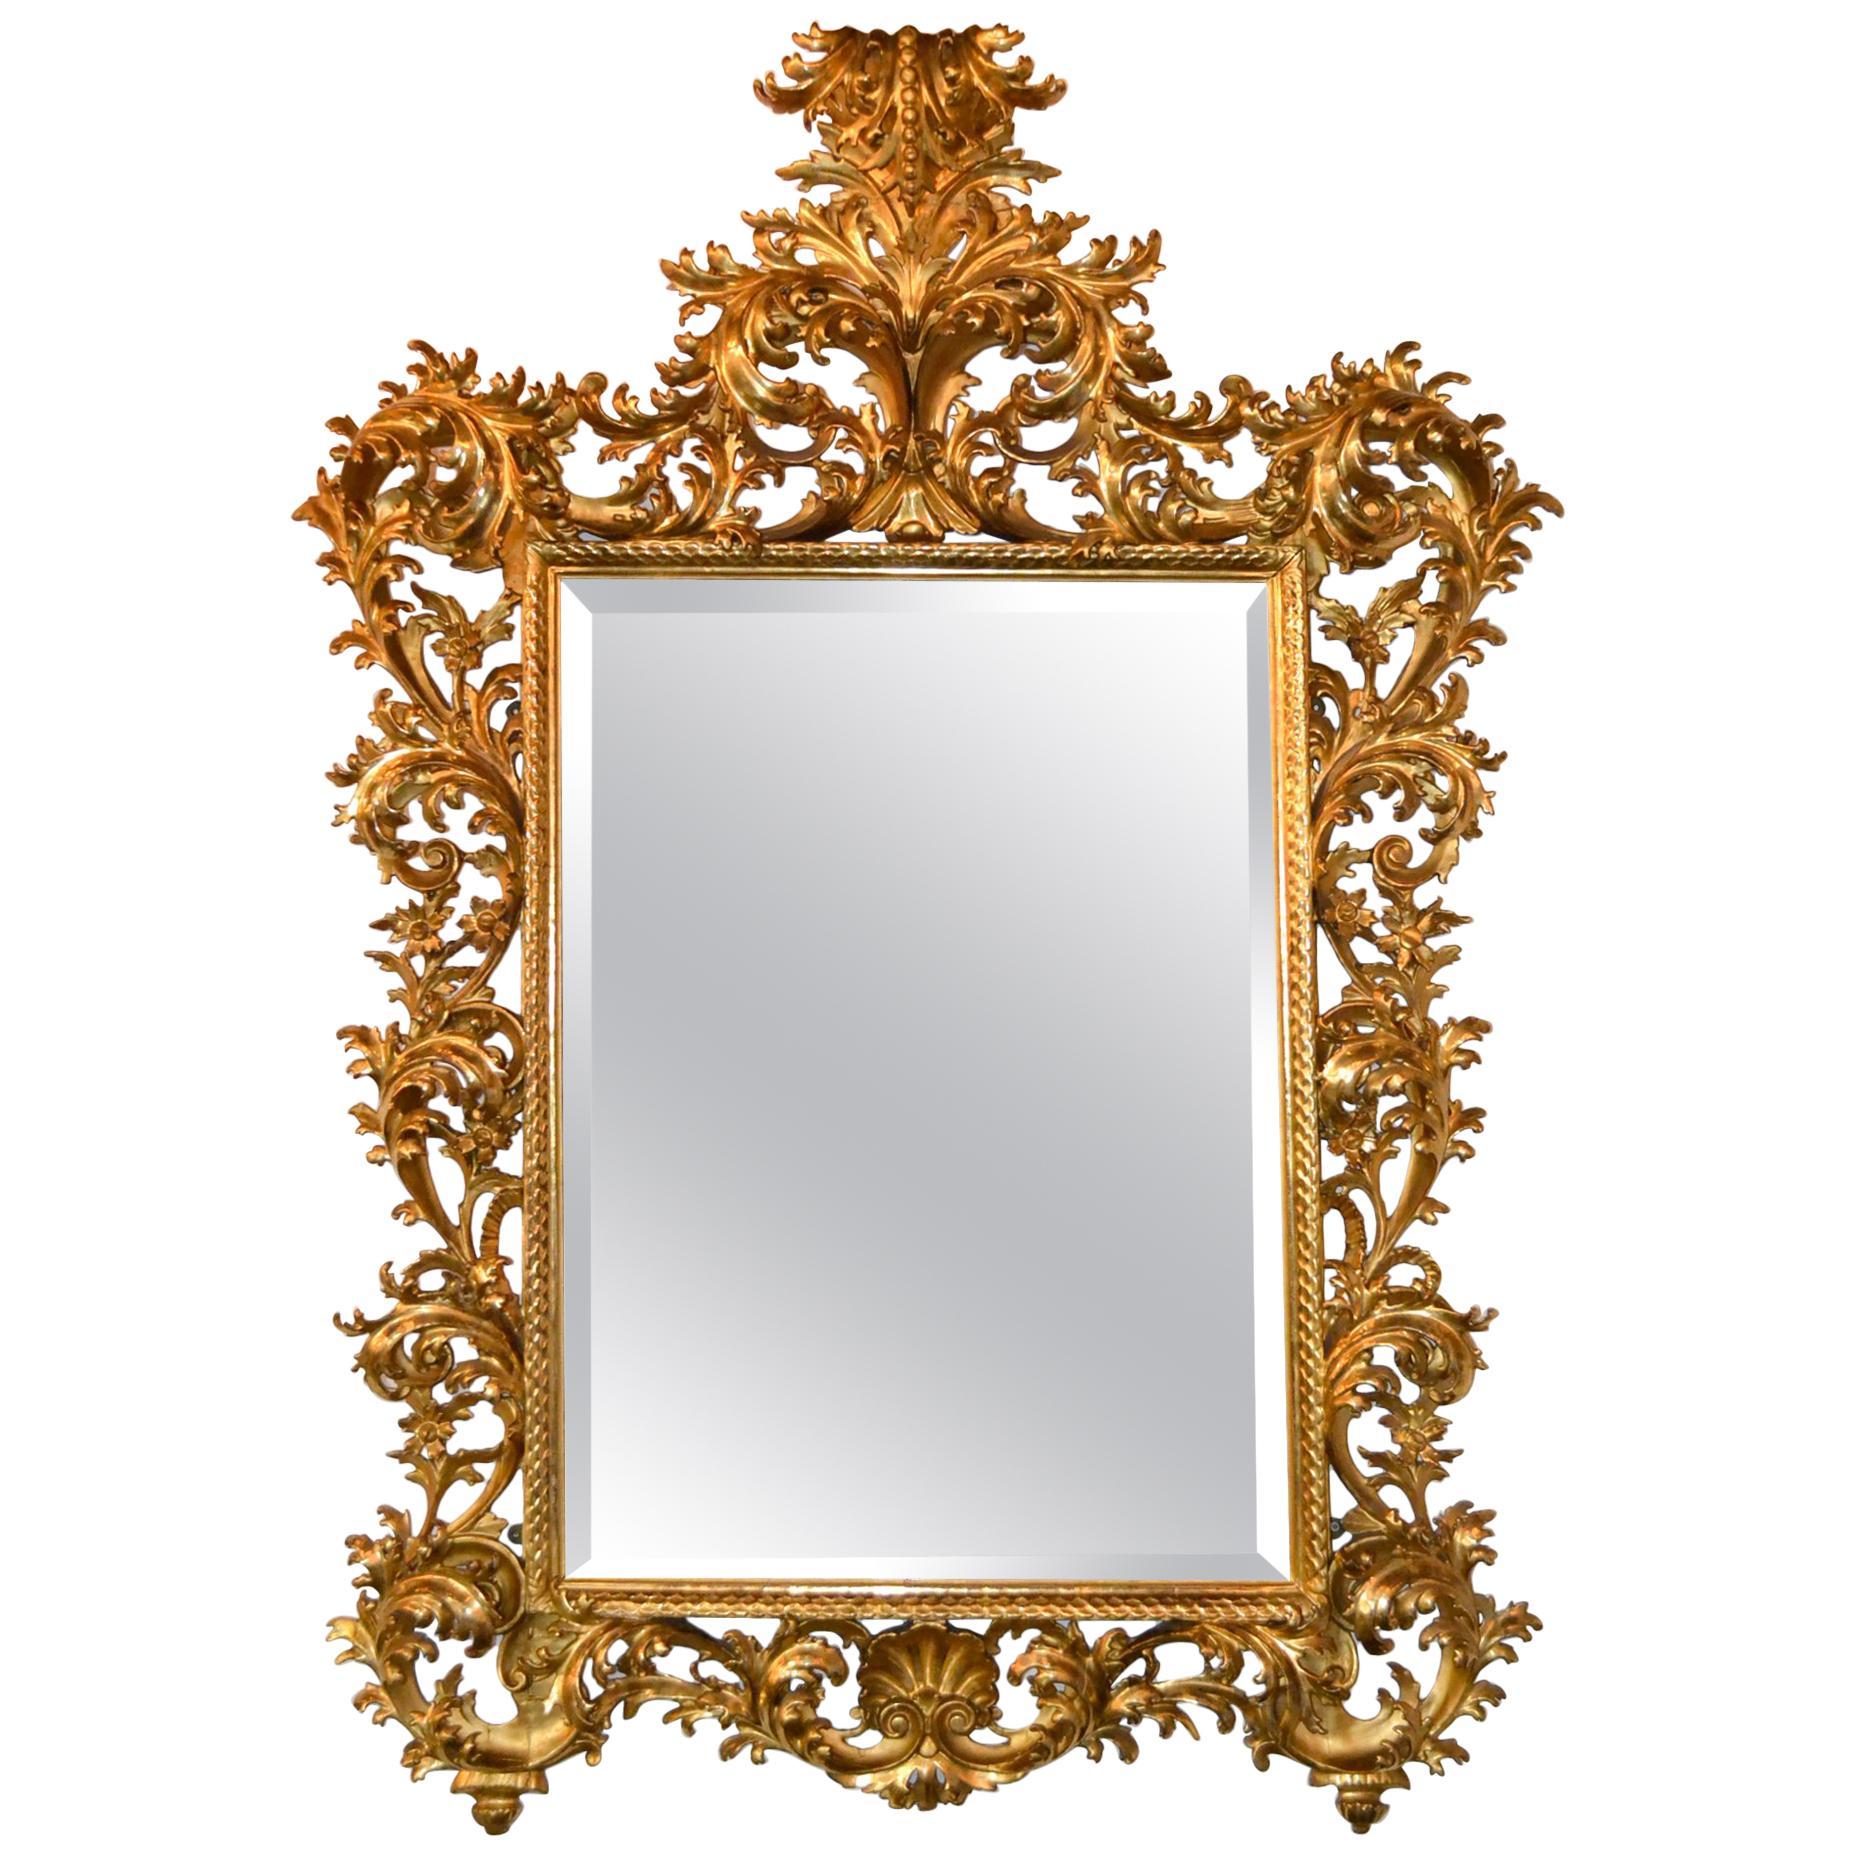 19th Century Italian Florentine Giltwood Mirror